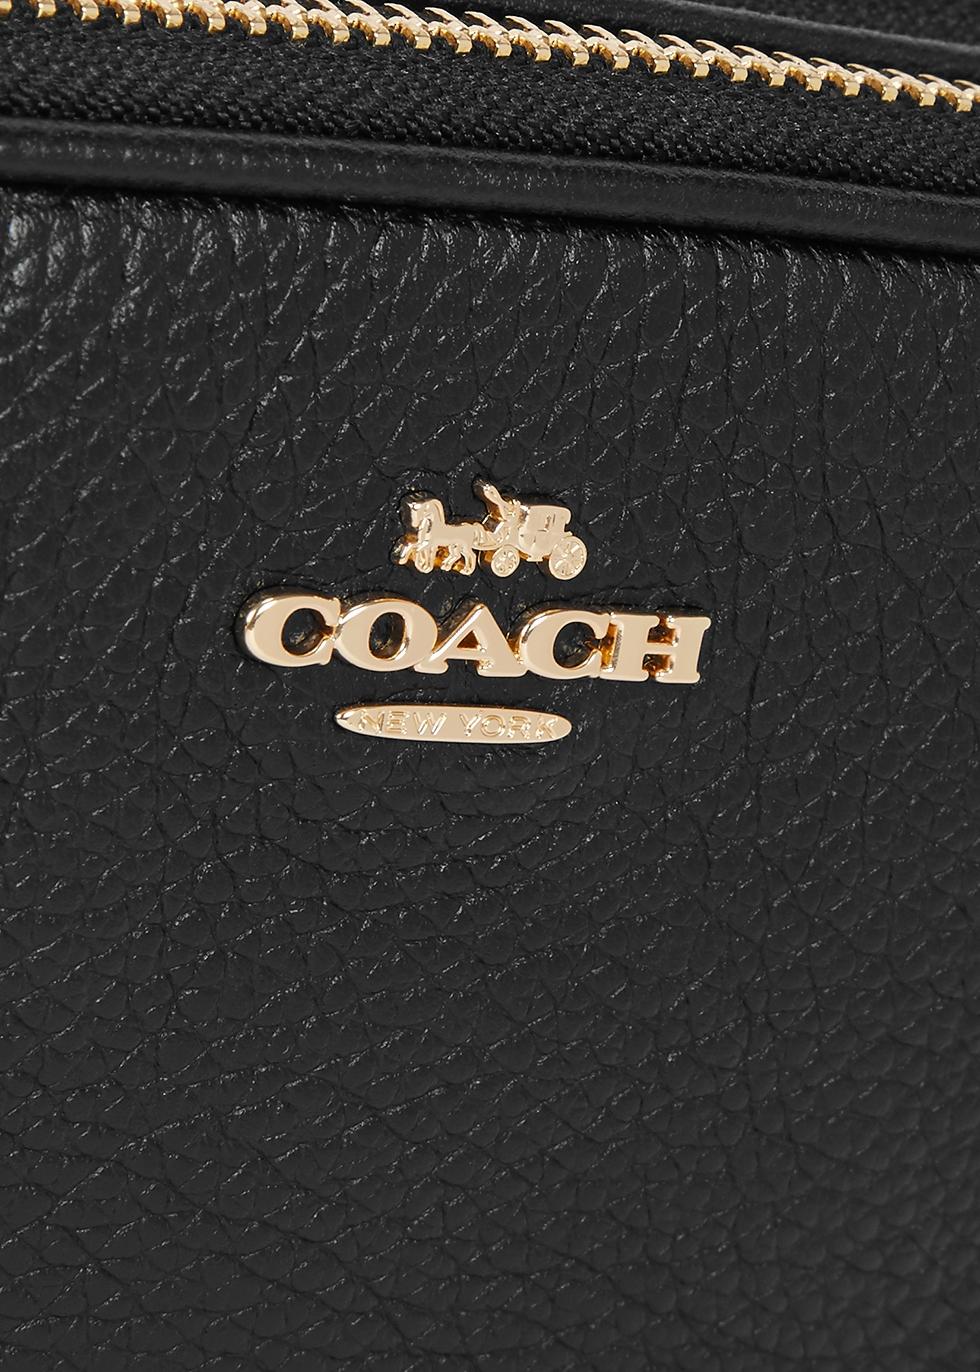 Sadie black leather cross-body bag - Coach